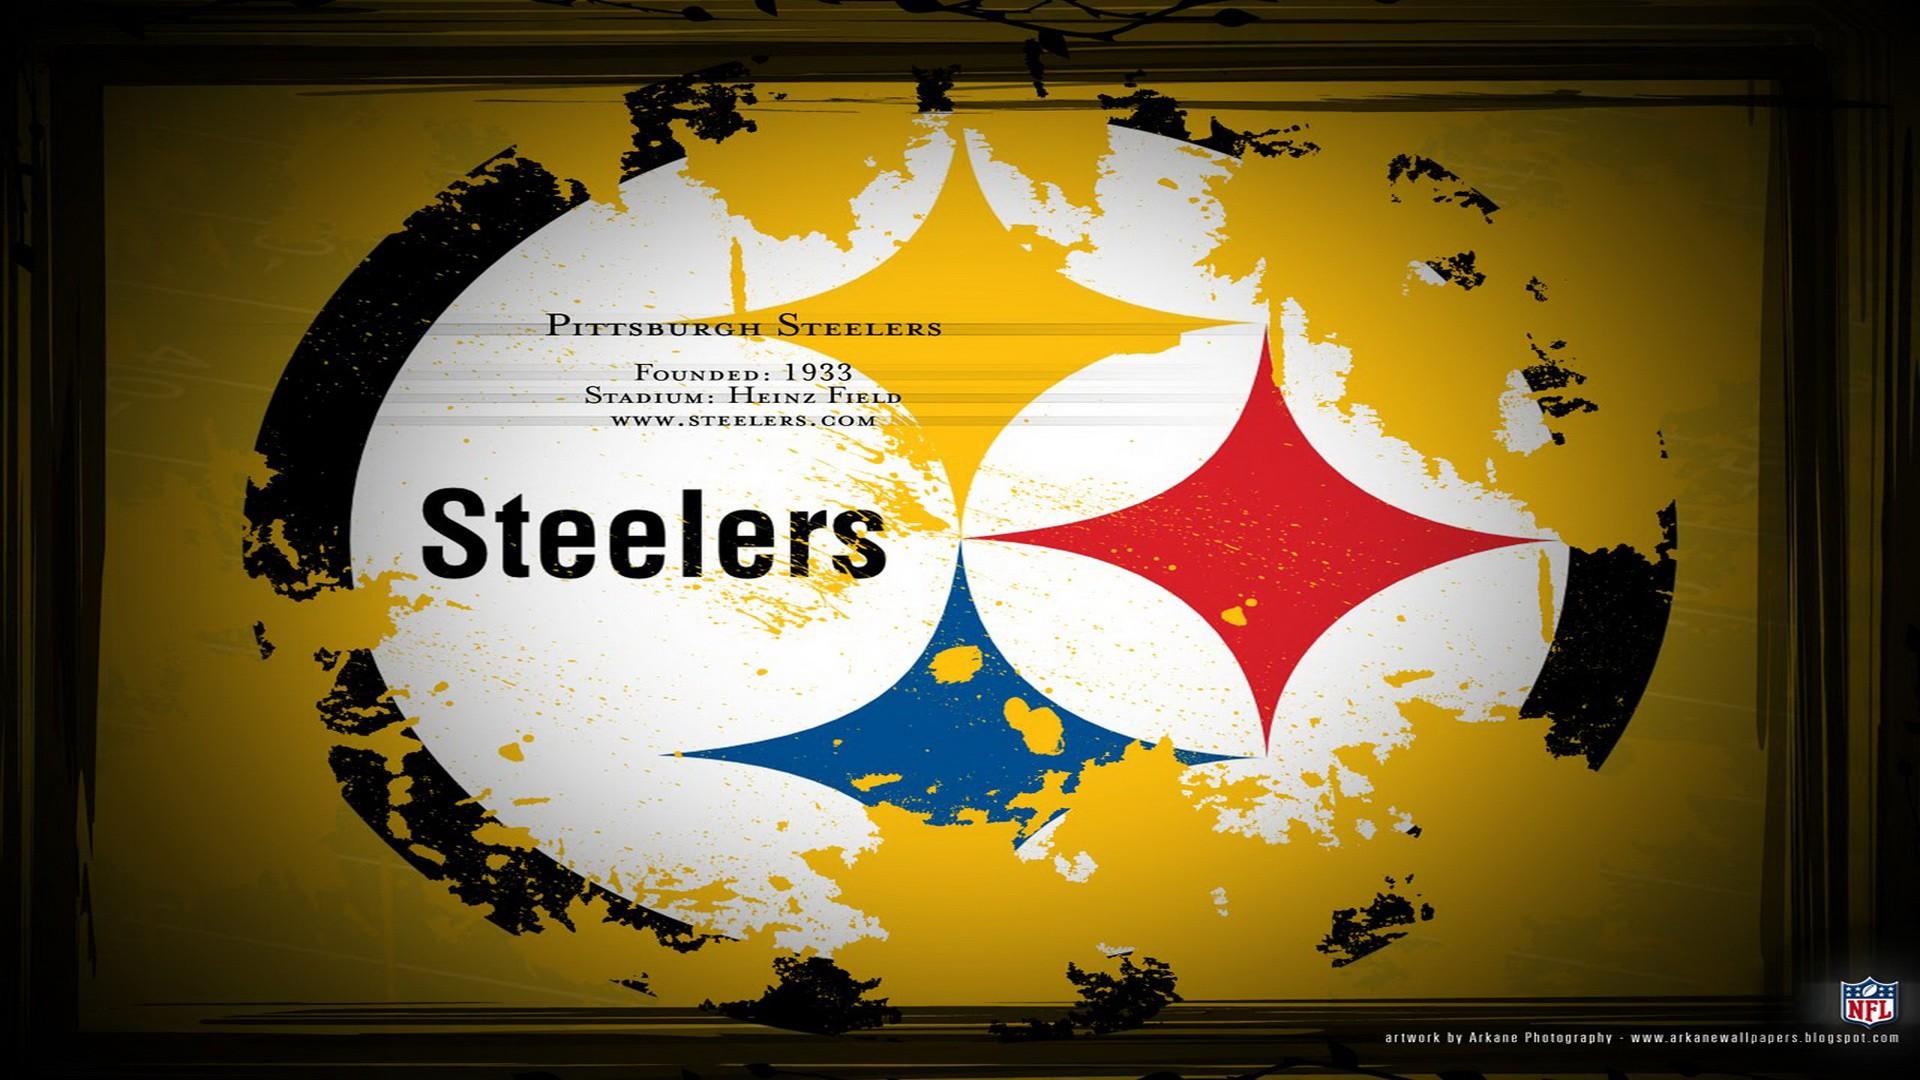 Steelers Wallpapers 2015 1920x1080